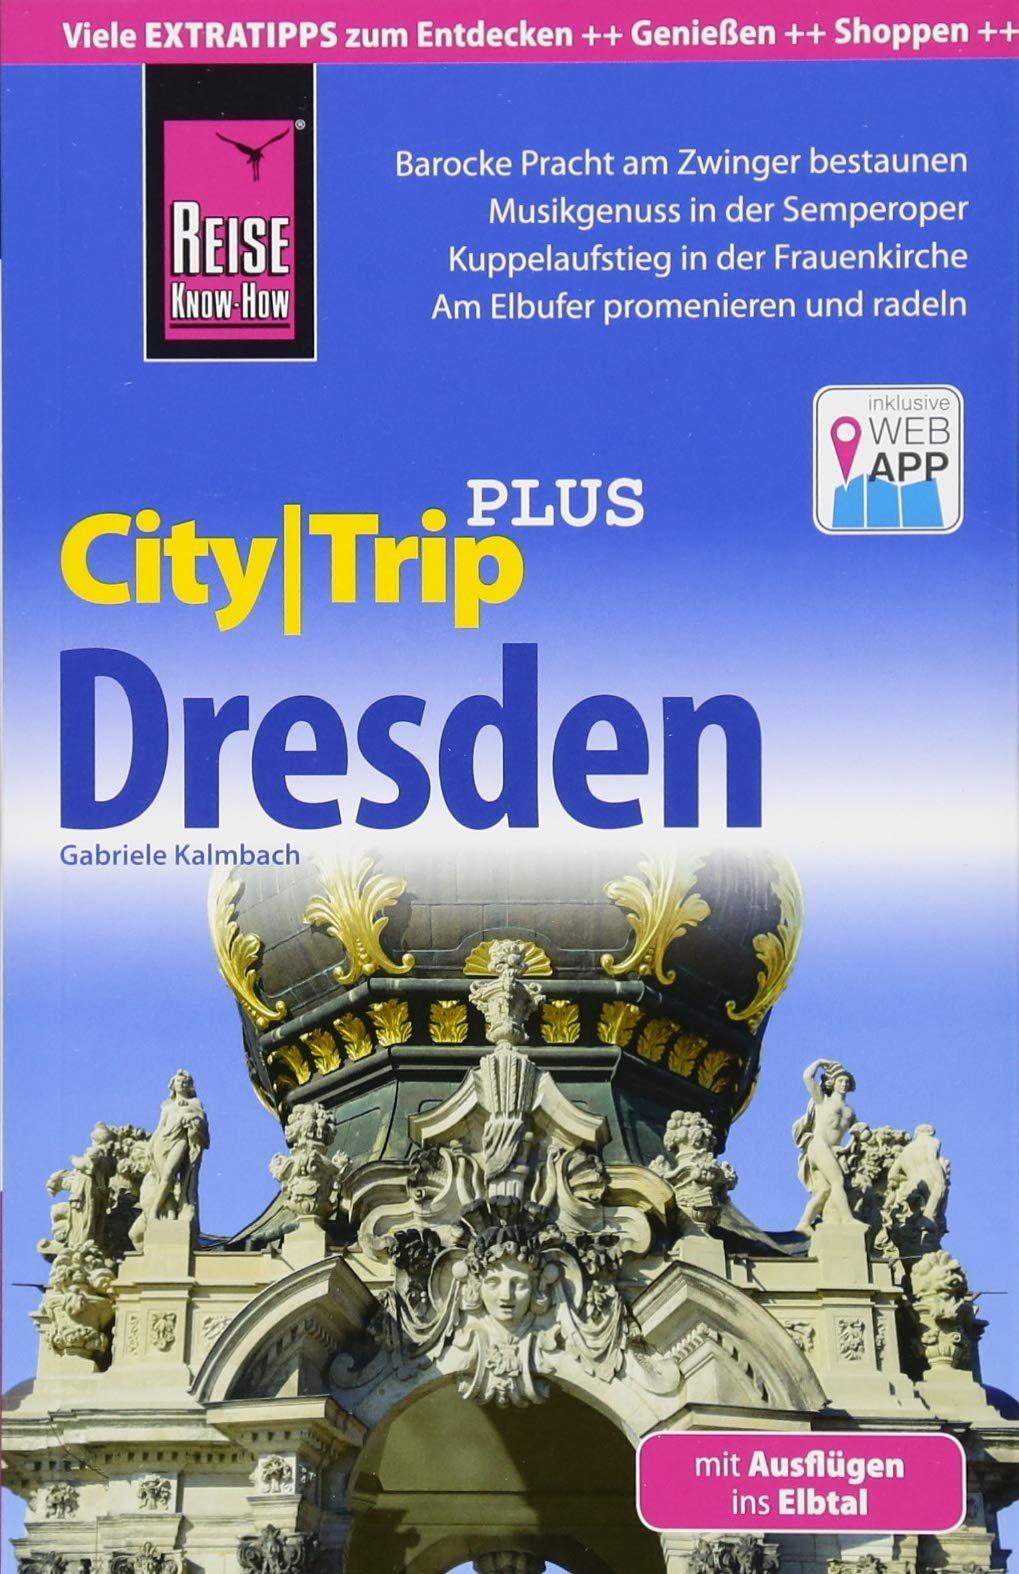 City Trip Dresden Plus 9783831730681  Reise Know-How City Trip  Reisgidsen Dresden